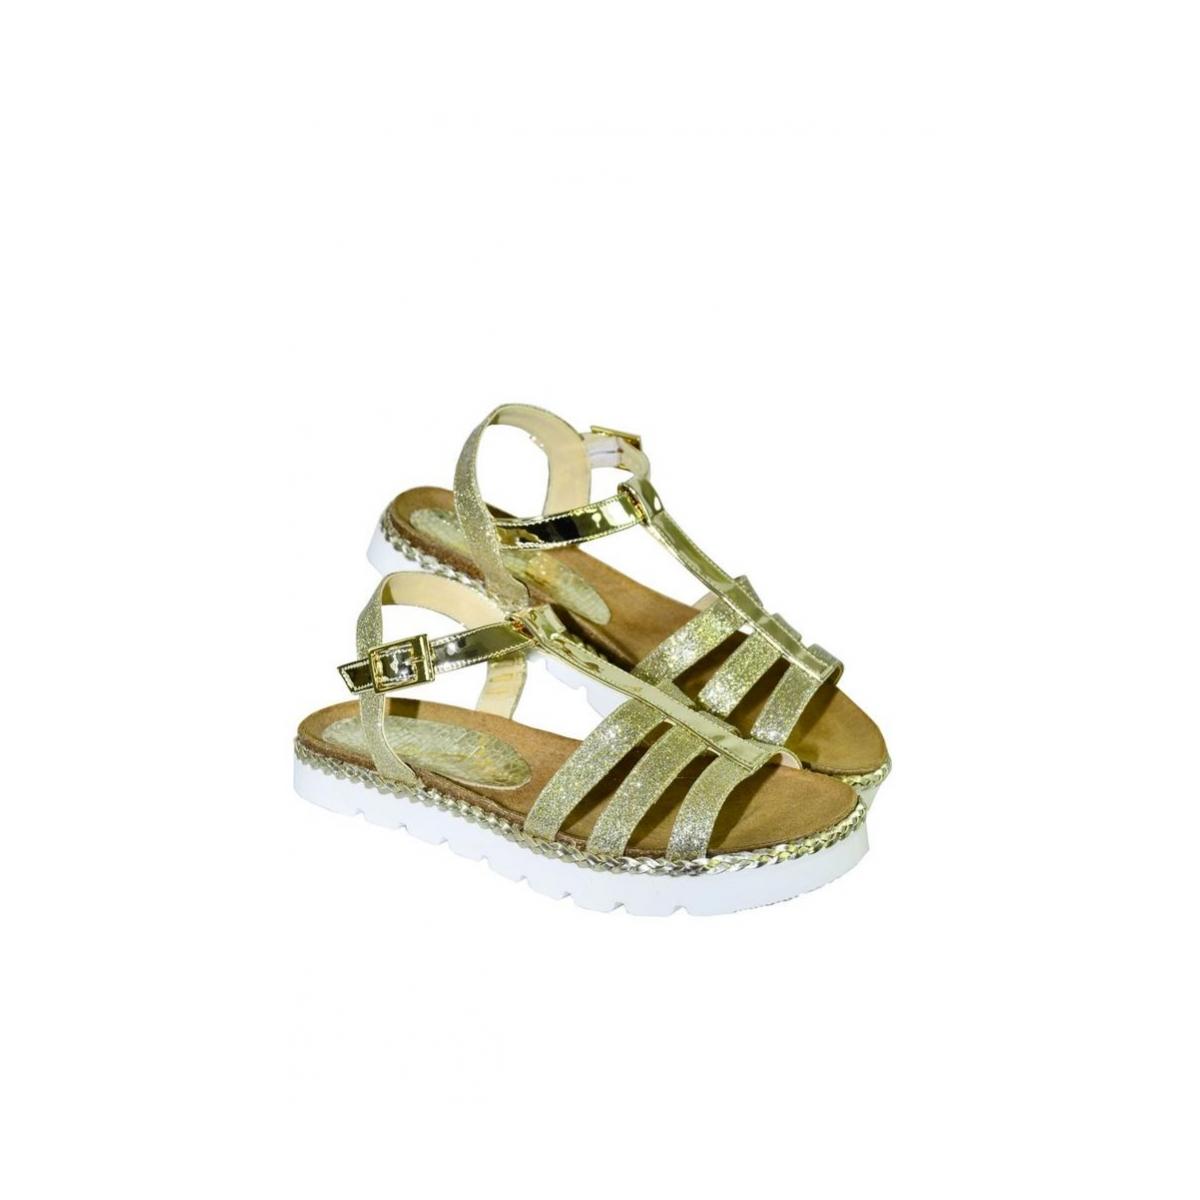 ce8a7207d24f4 Zlaté kožené nízke sandále TARO | Johnc.sk